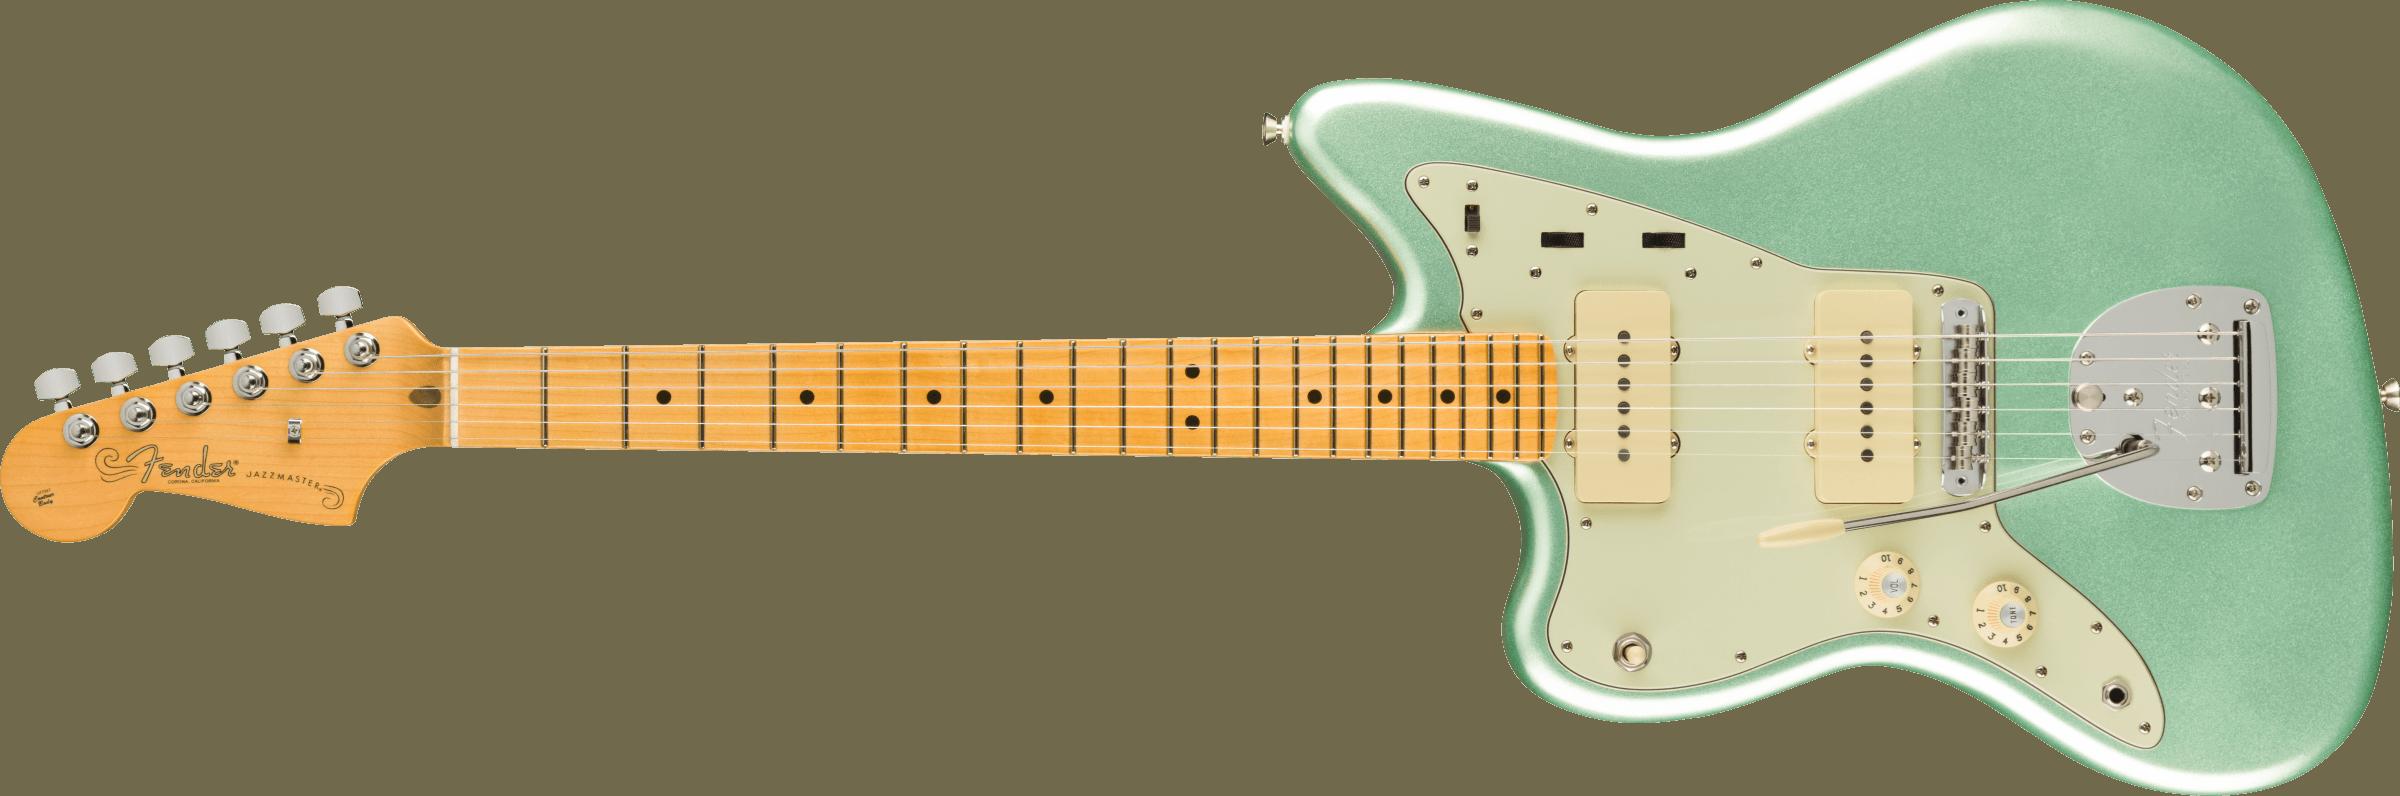 Fender American Professional II Jazzmaster® Left-Hand, Maple Fingerboard, Mystic Surf Green